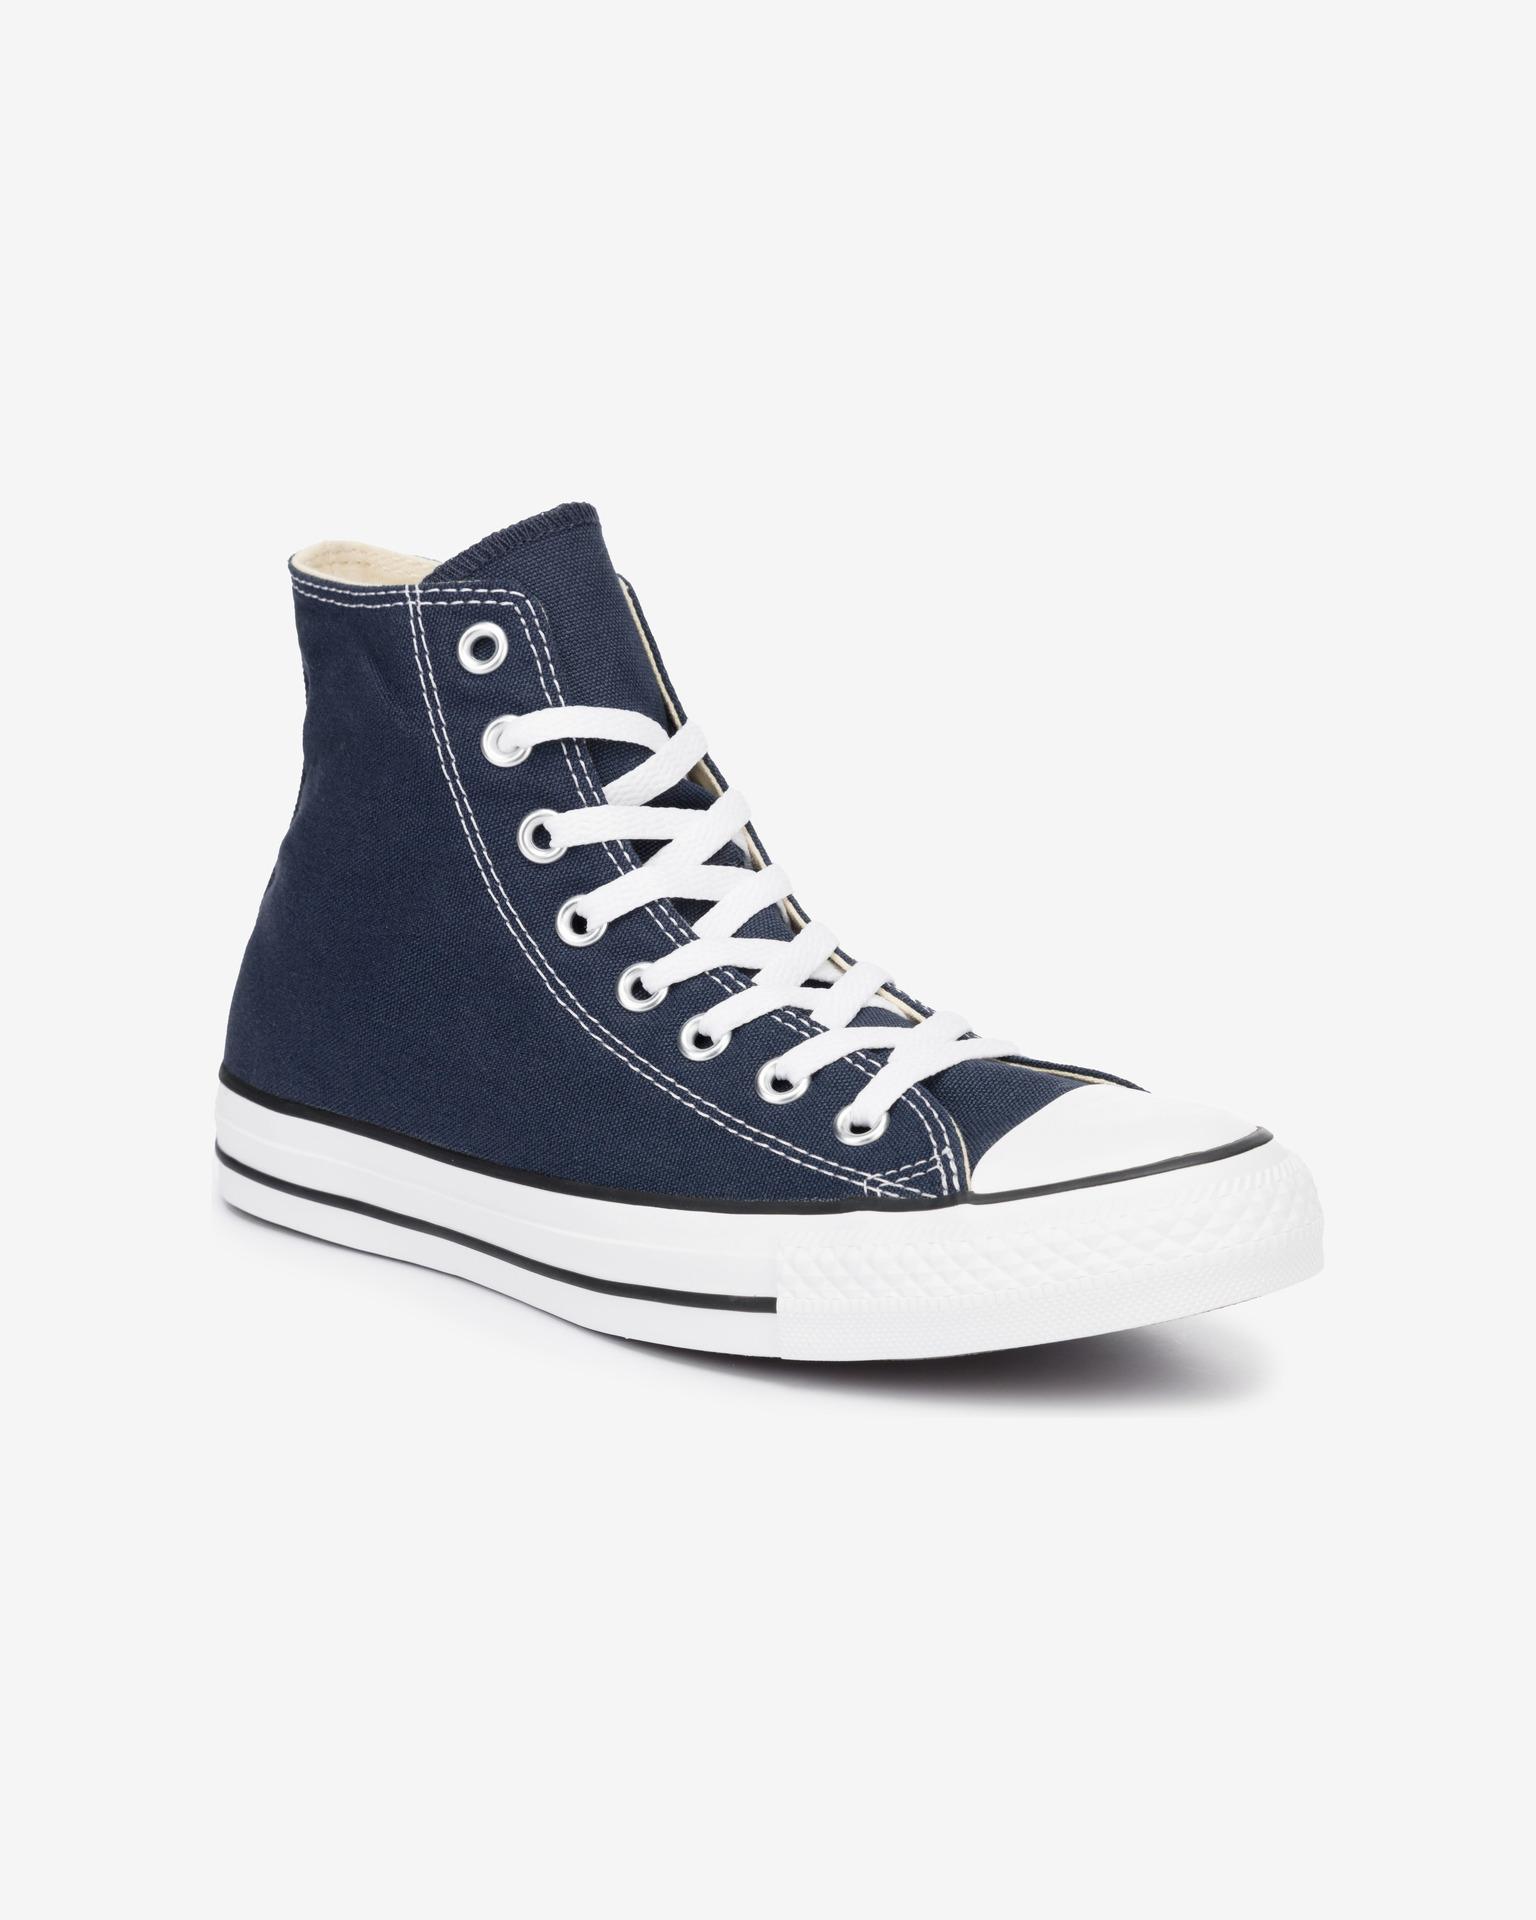 Converse modré pánské boty Chuck Taylor All Star Navy